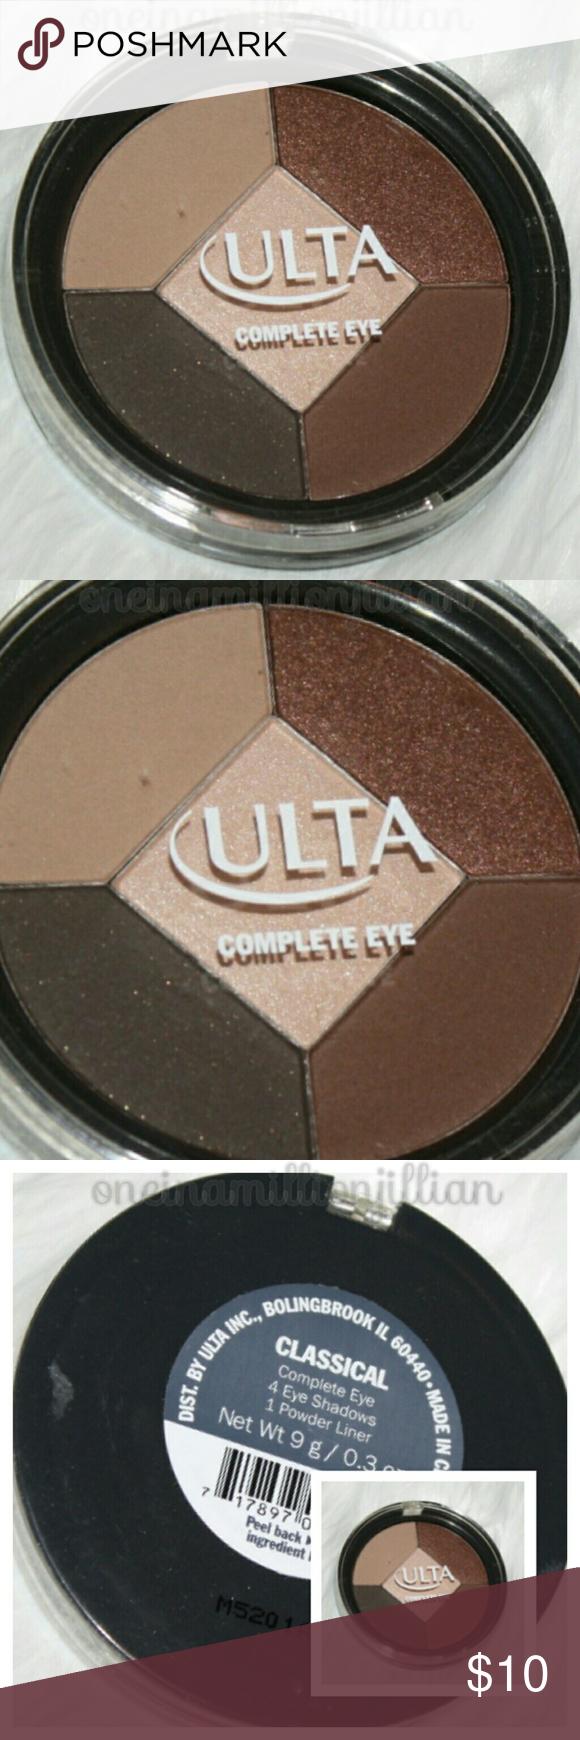 Ulta Complete Eye Shadow & Liner Palette New/Sealed Full